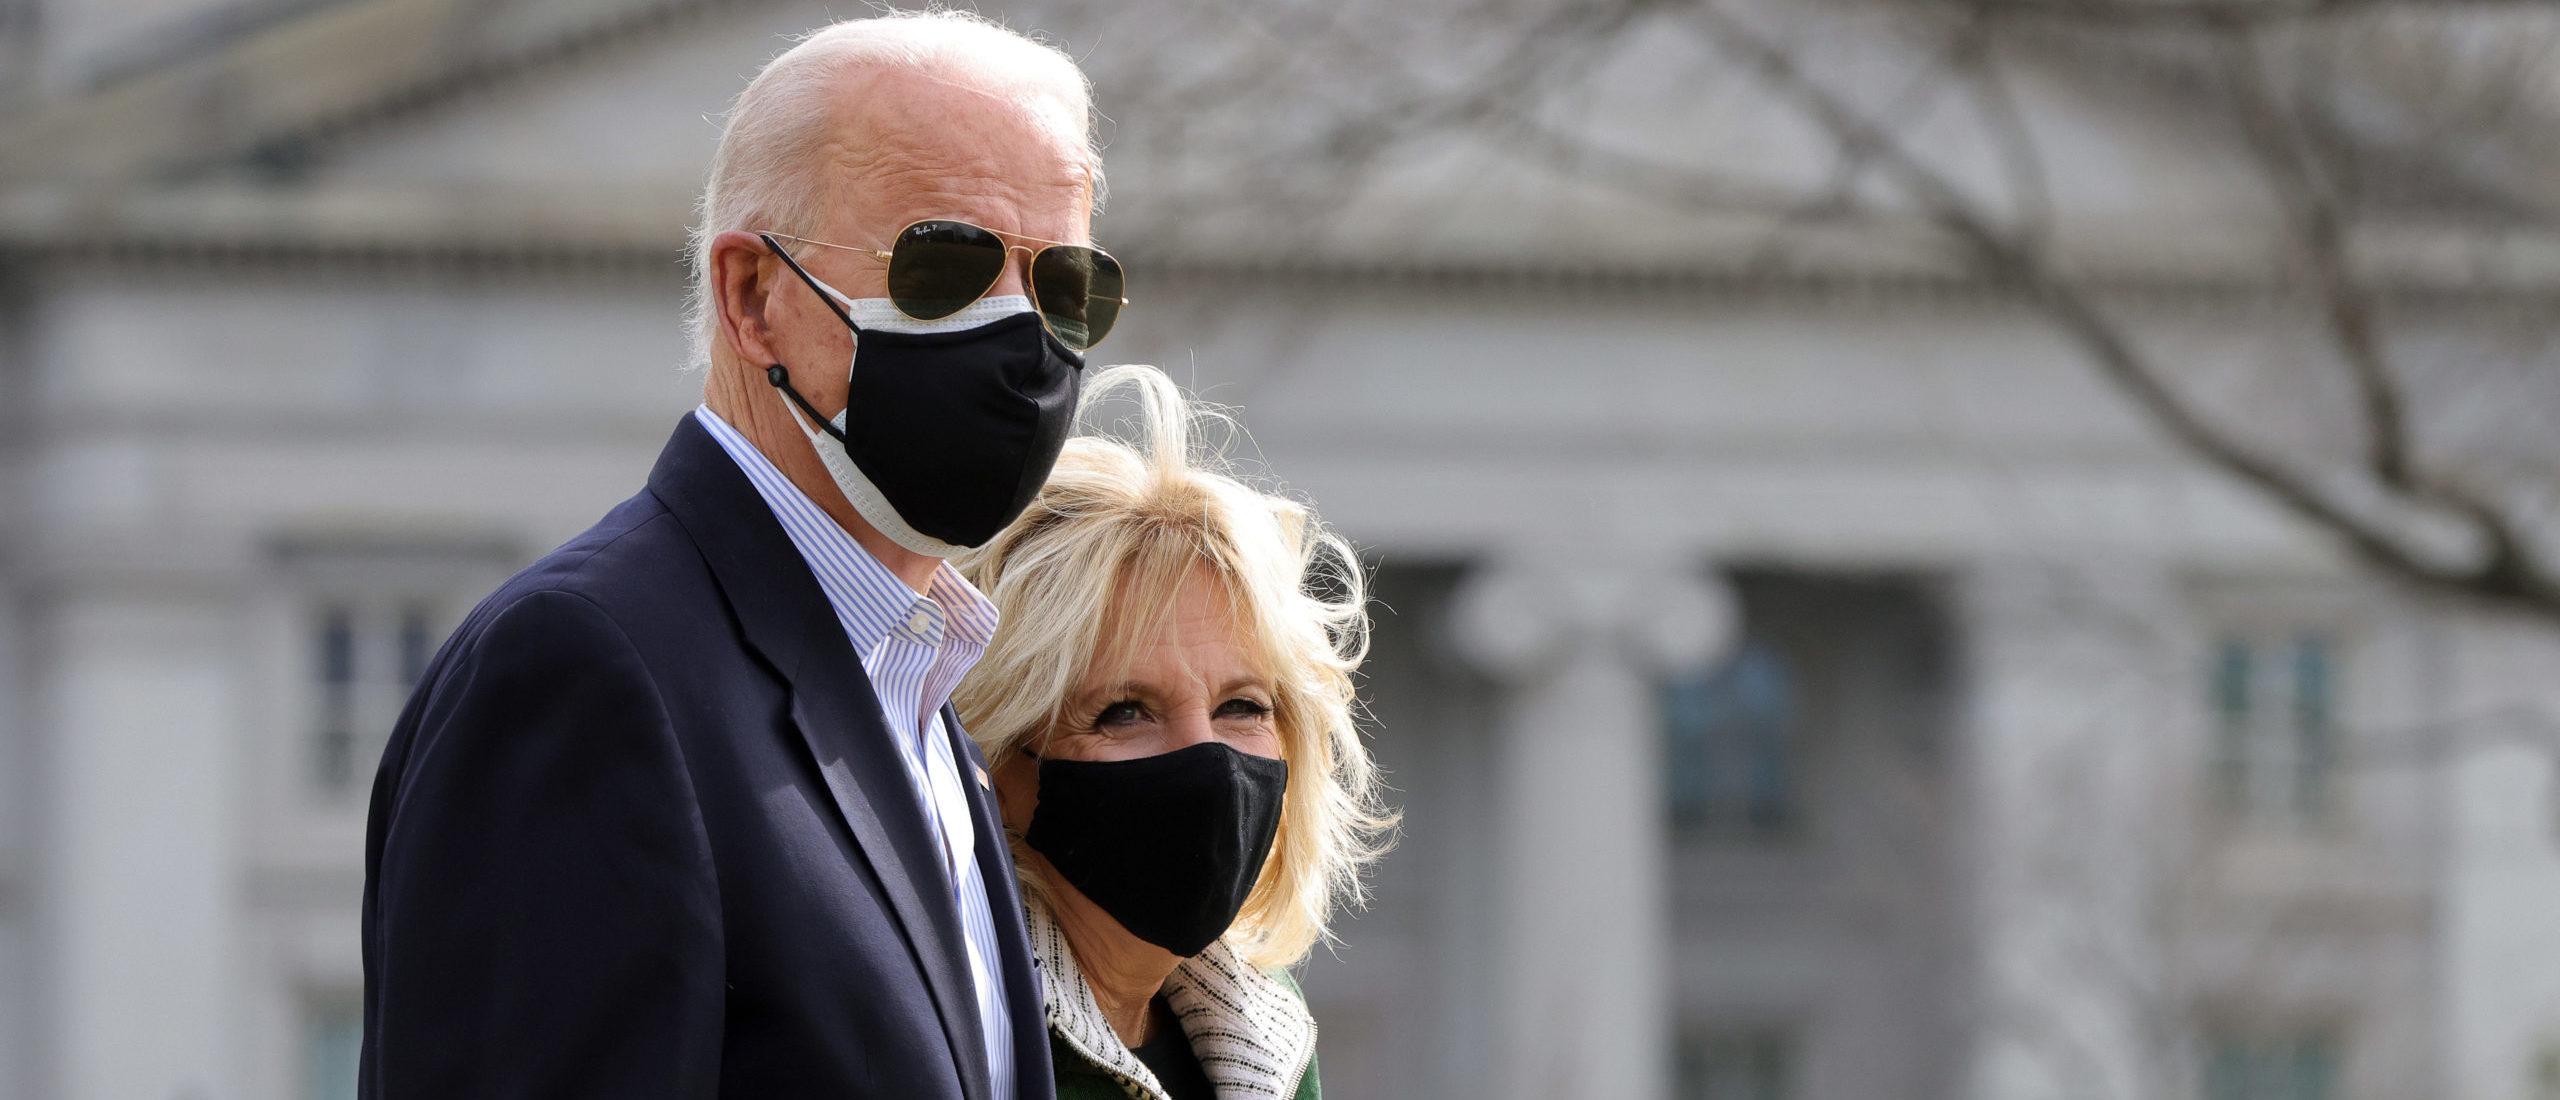 EXCLUSIVE: Biden Admin Exploring Ways To Advance Pandemic Eviction Moratorium Despite Judge's Unconstitutional Ruling